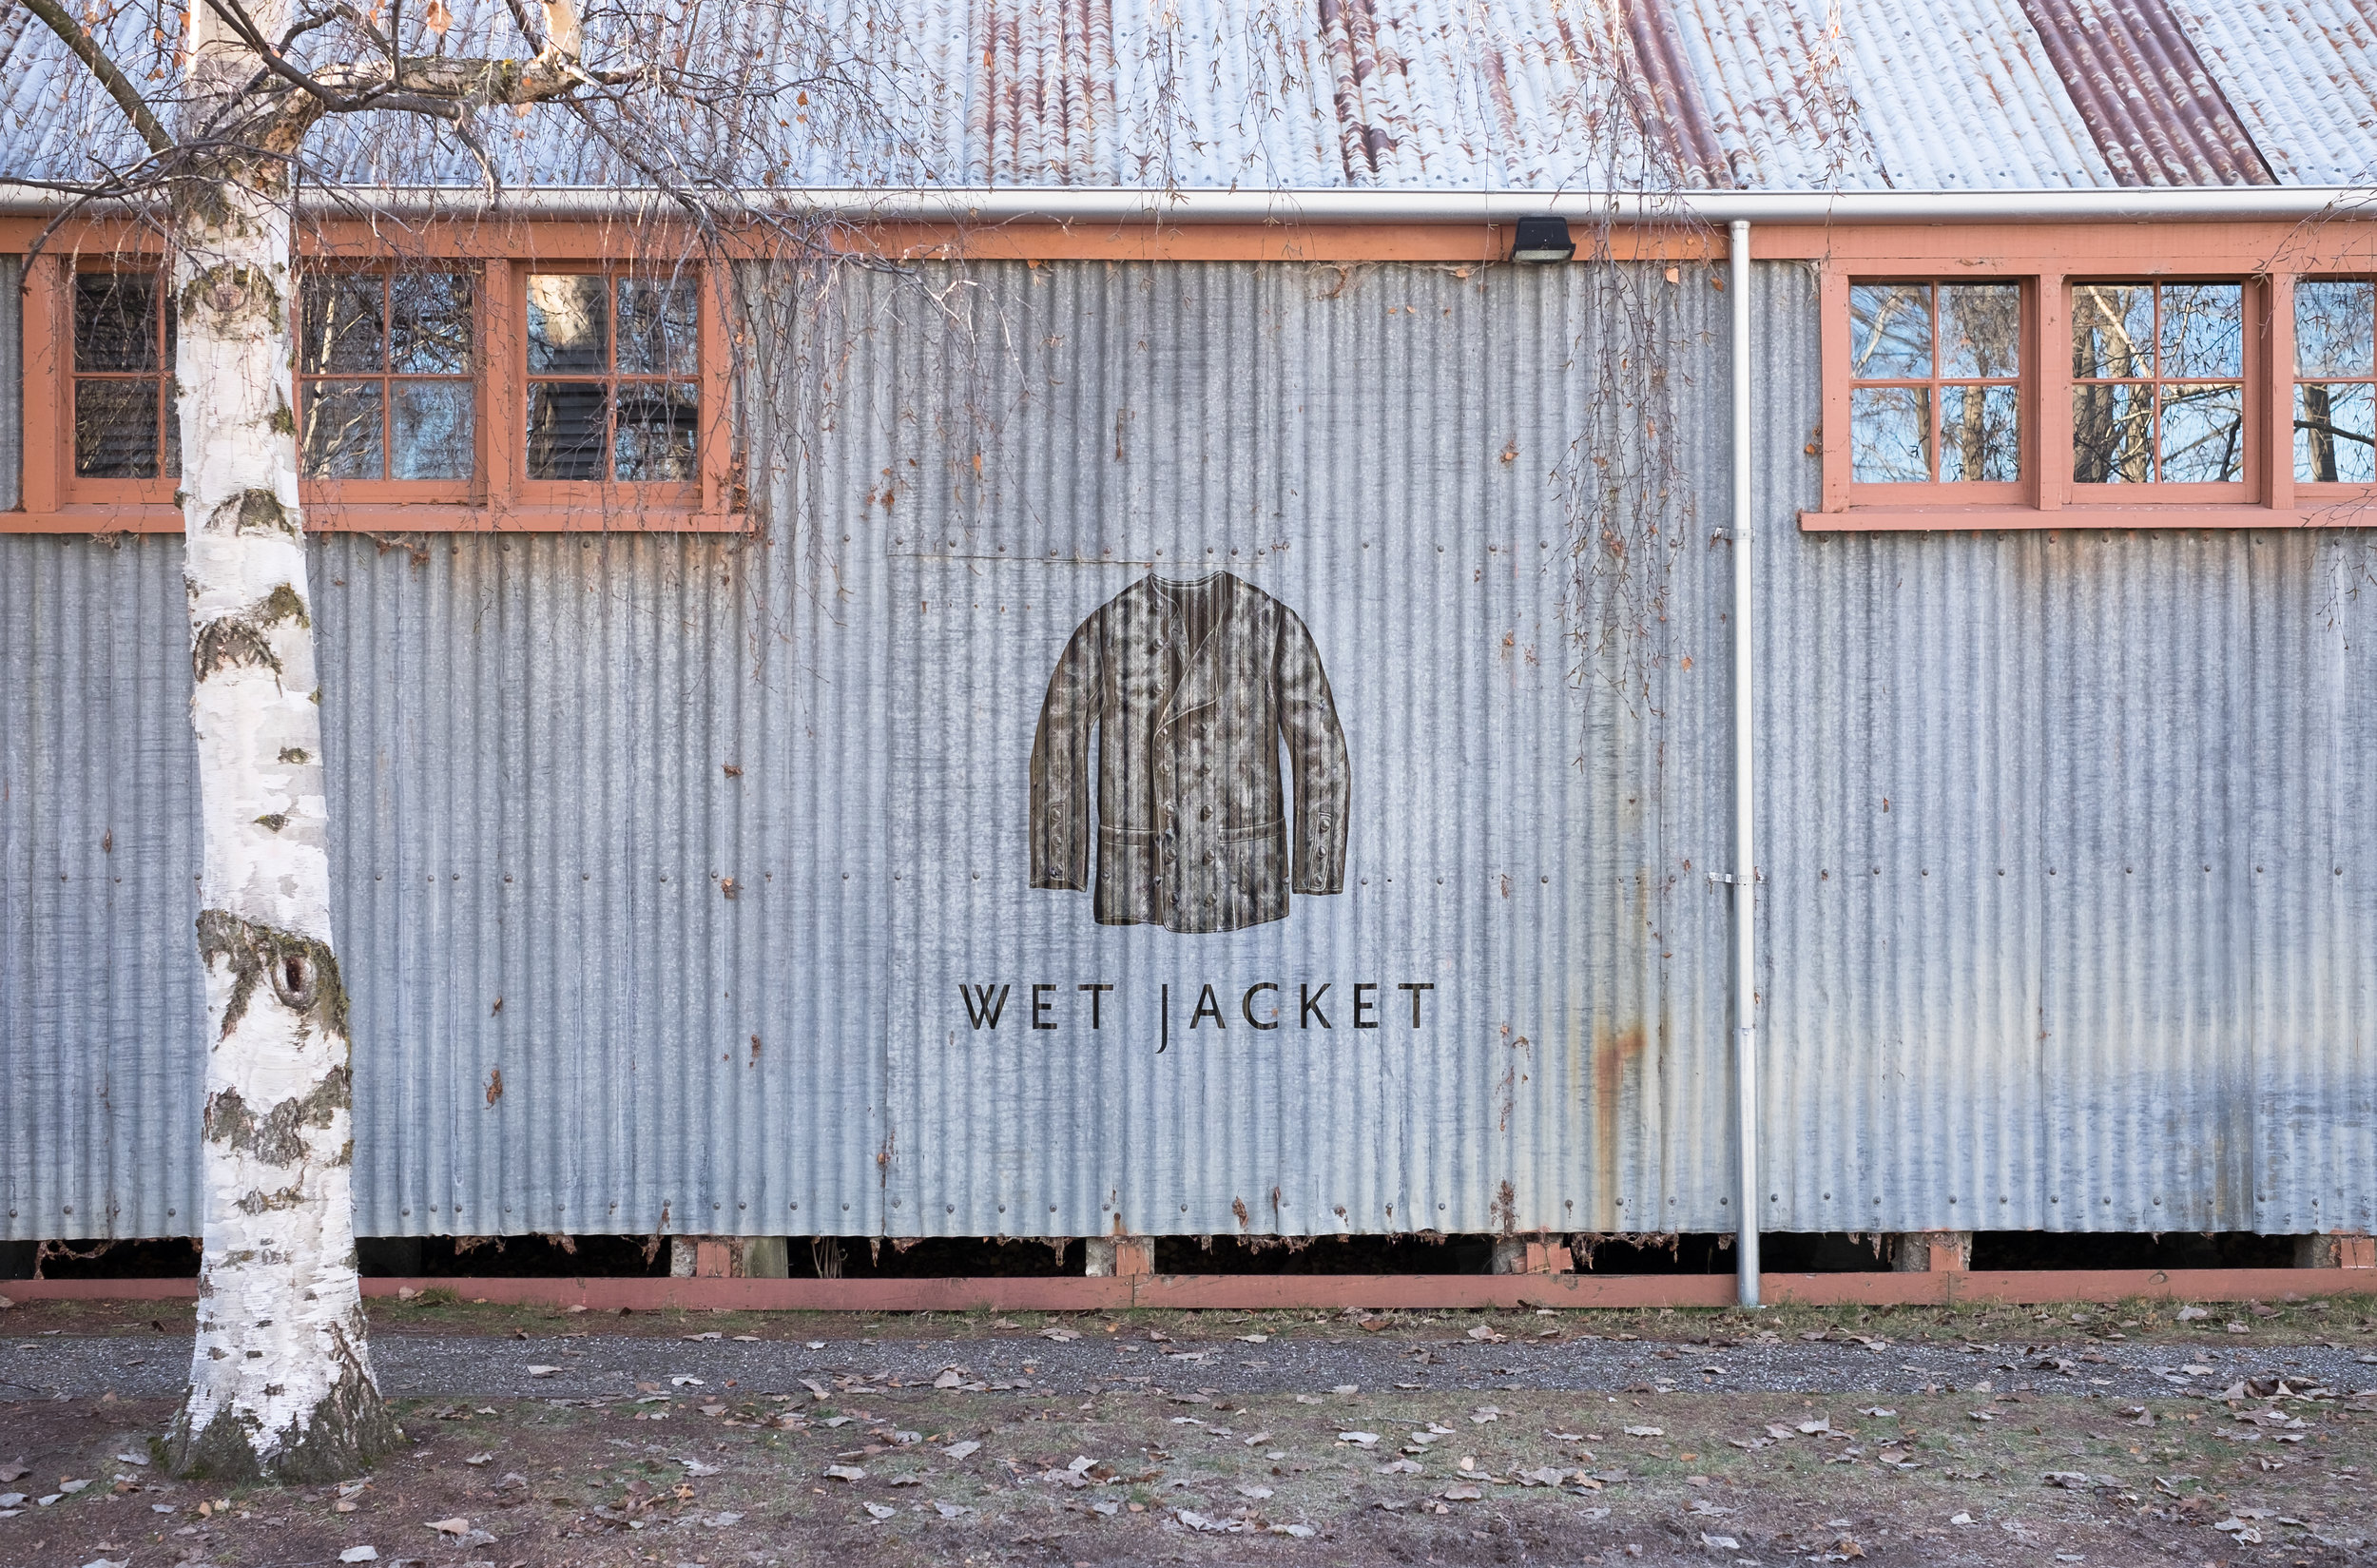 WetJacketWines-JKPhoto-August2016-14.jpg